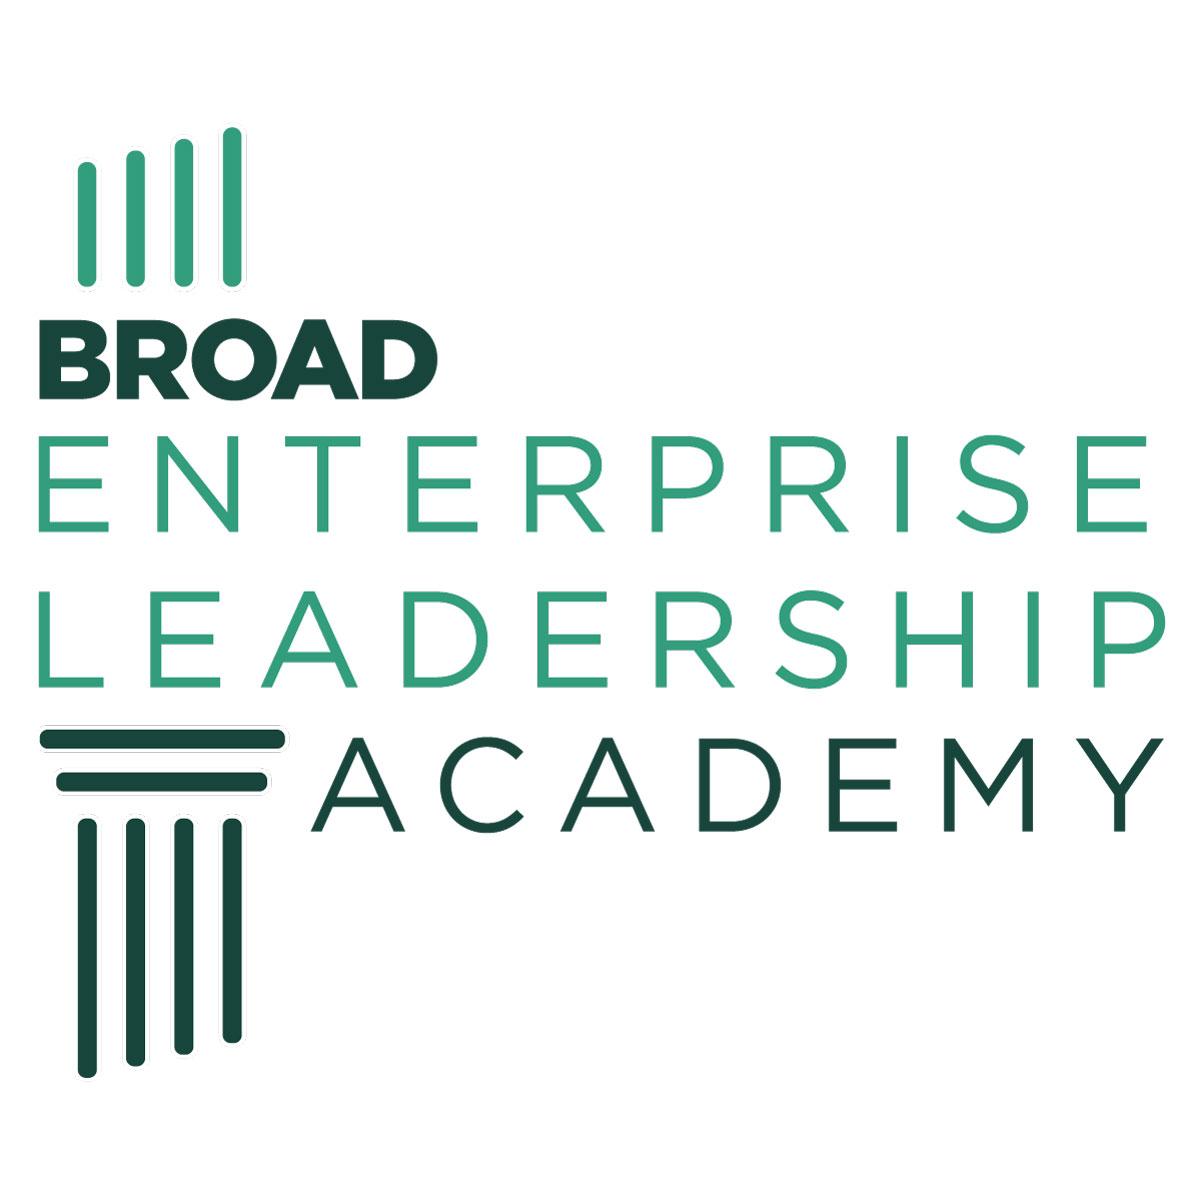 Broad Enterprise Leadership Academy